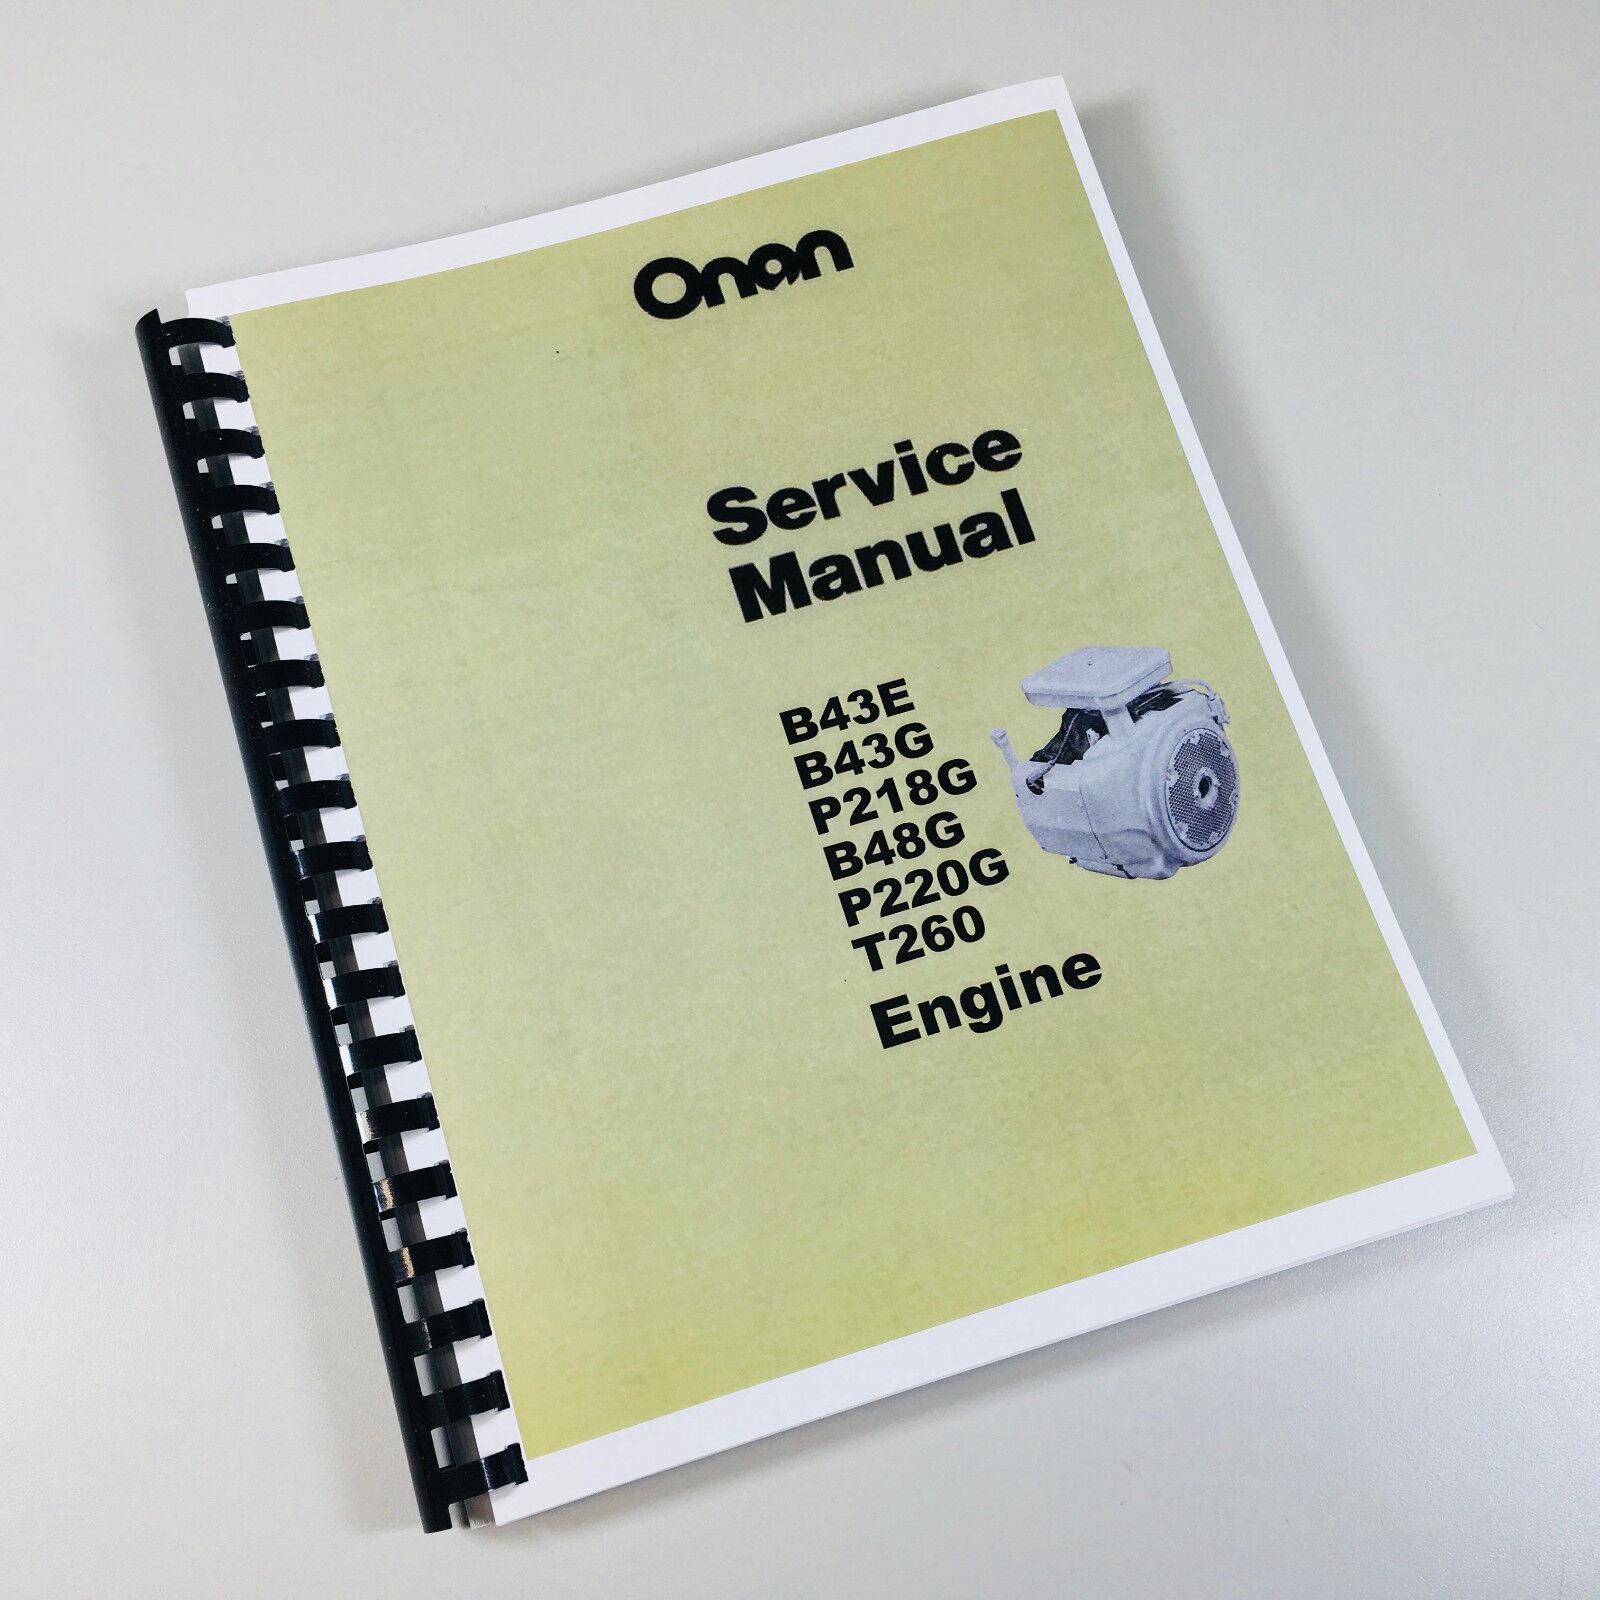 service manual for john deere 420 lawn mower garden tractor onan rh ebay com Onan P220G Replacement Engine Onan P220G Engine Block